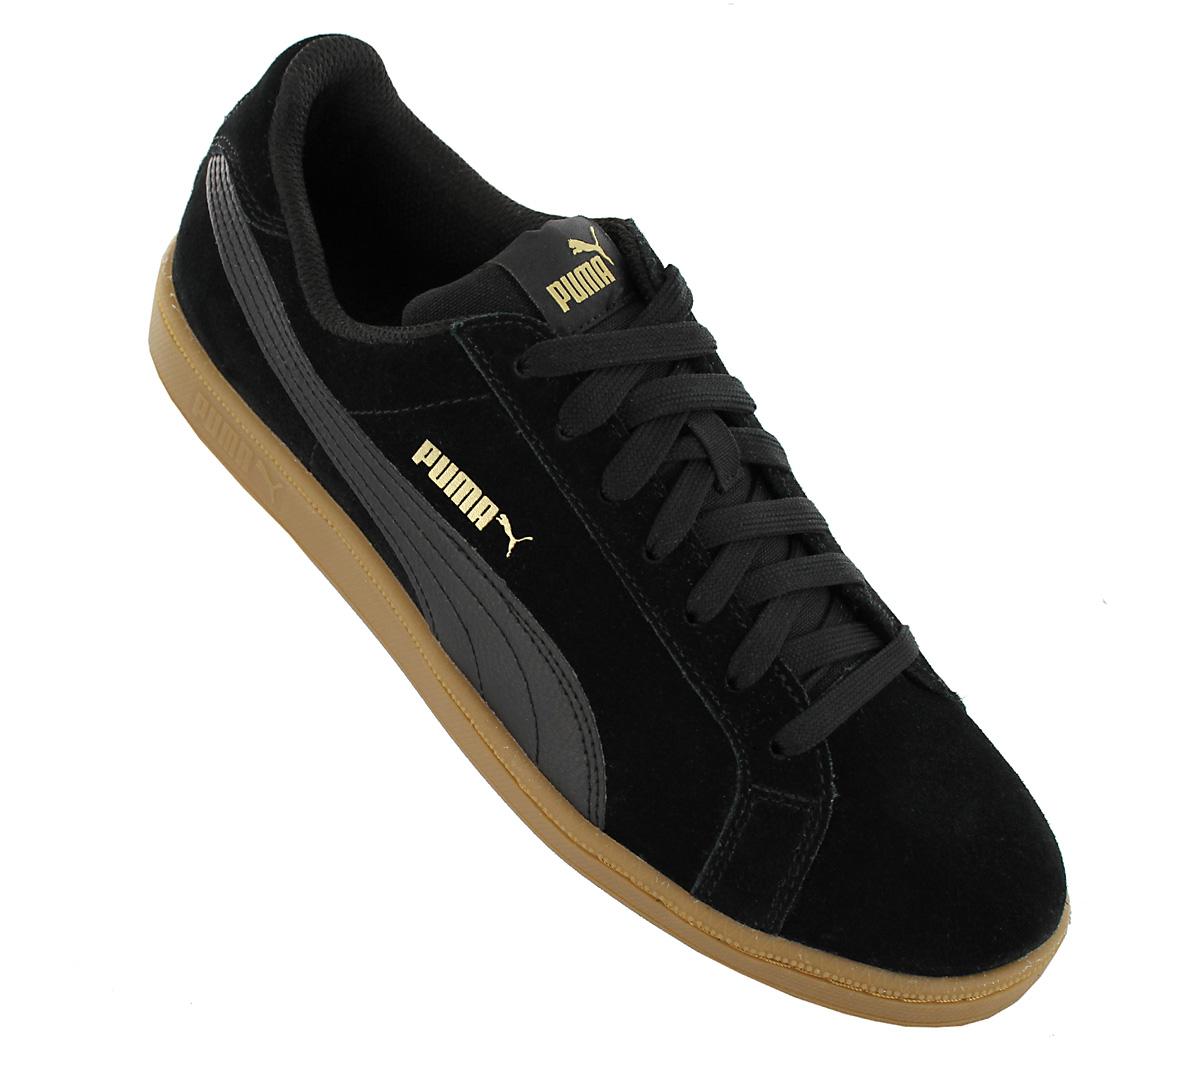 Puma Smash Sd Men s Sneakers Shoes Black Suede Trainers 361730-30 ... 9b51ffead